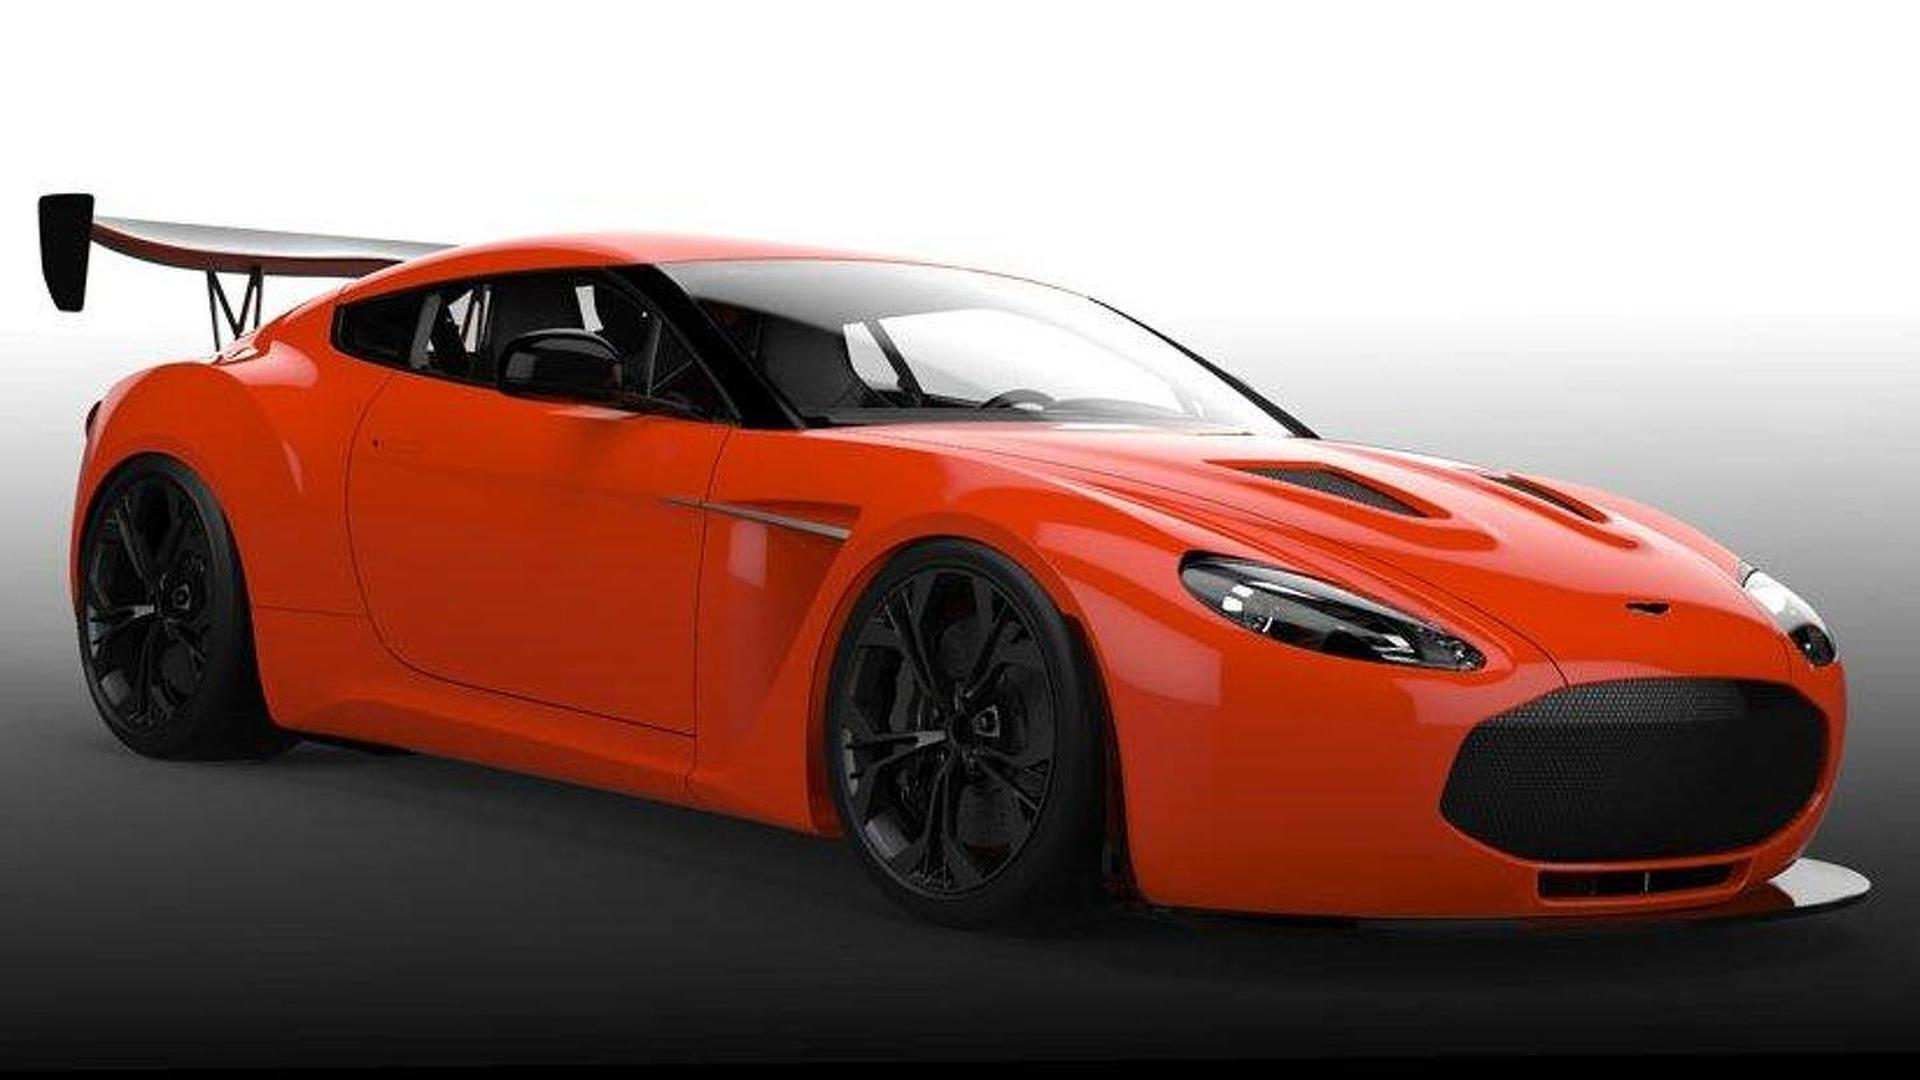 Race Prepped Aston Martin V12 Zagato Previewed